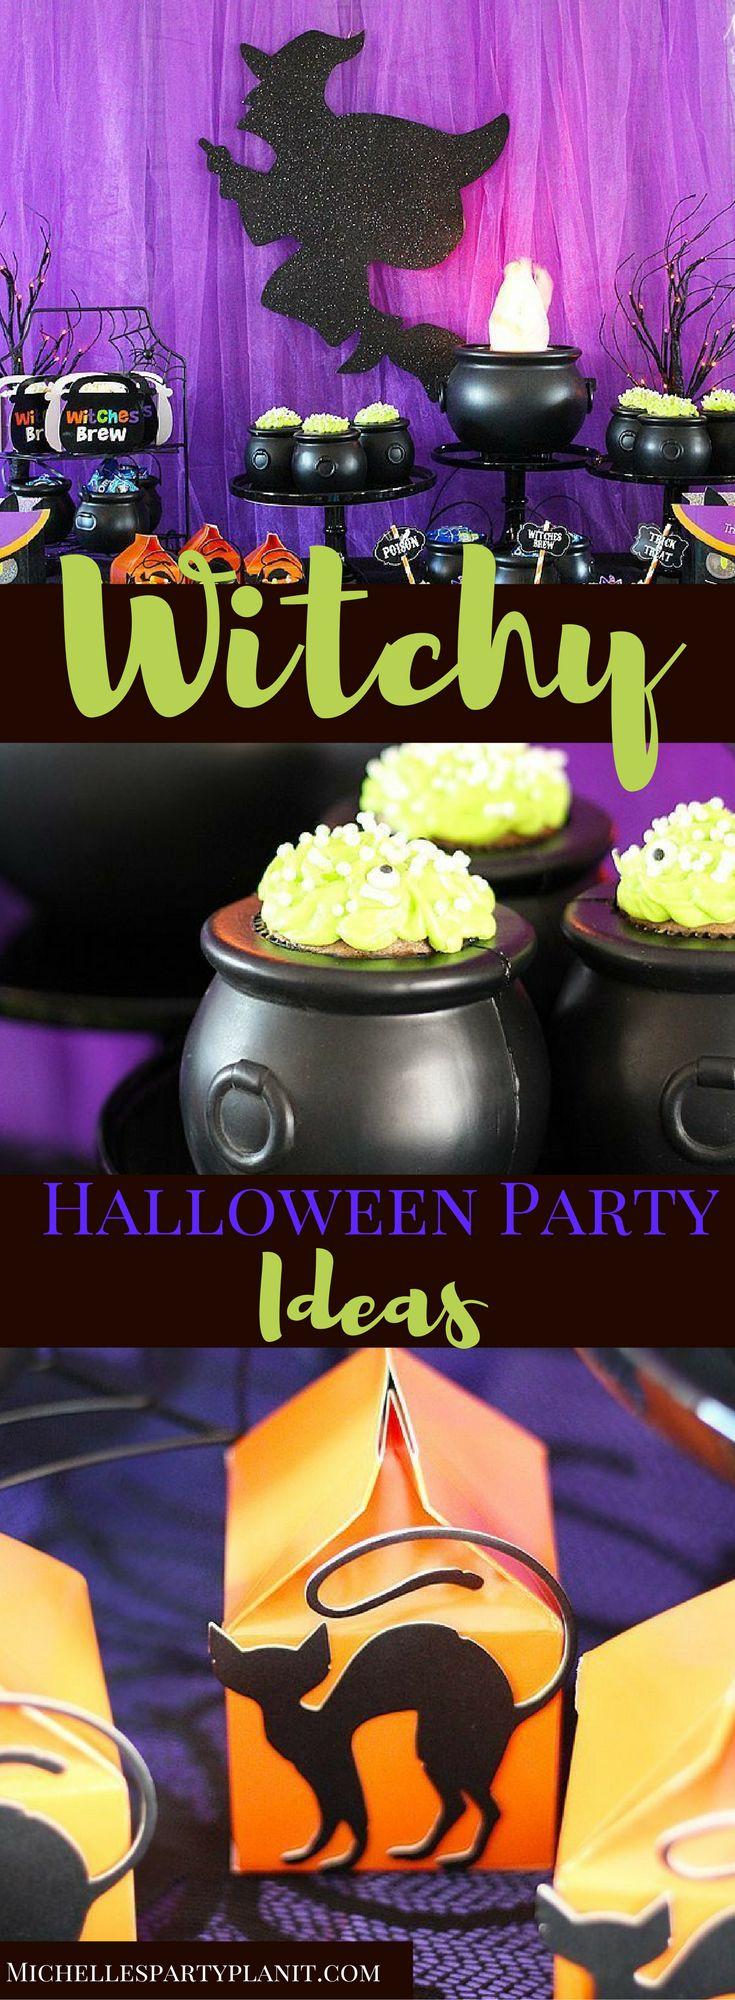 The 25+ best Halloween party games ideas on Pinterest | Class ...